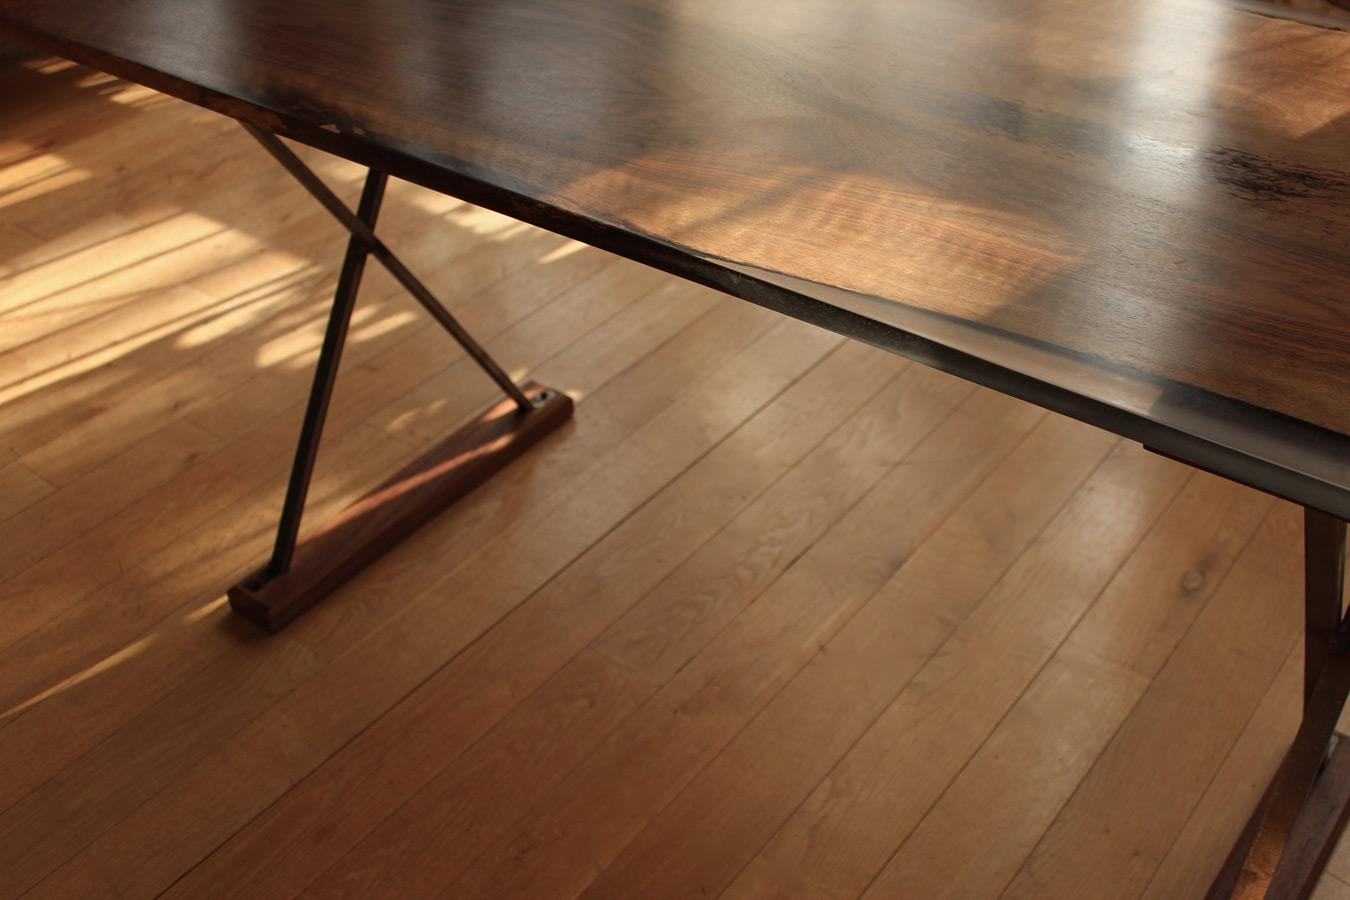 30_Ripple-English-walnut-table-with-cross-legs_4.jpg